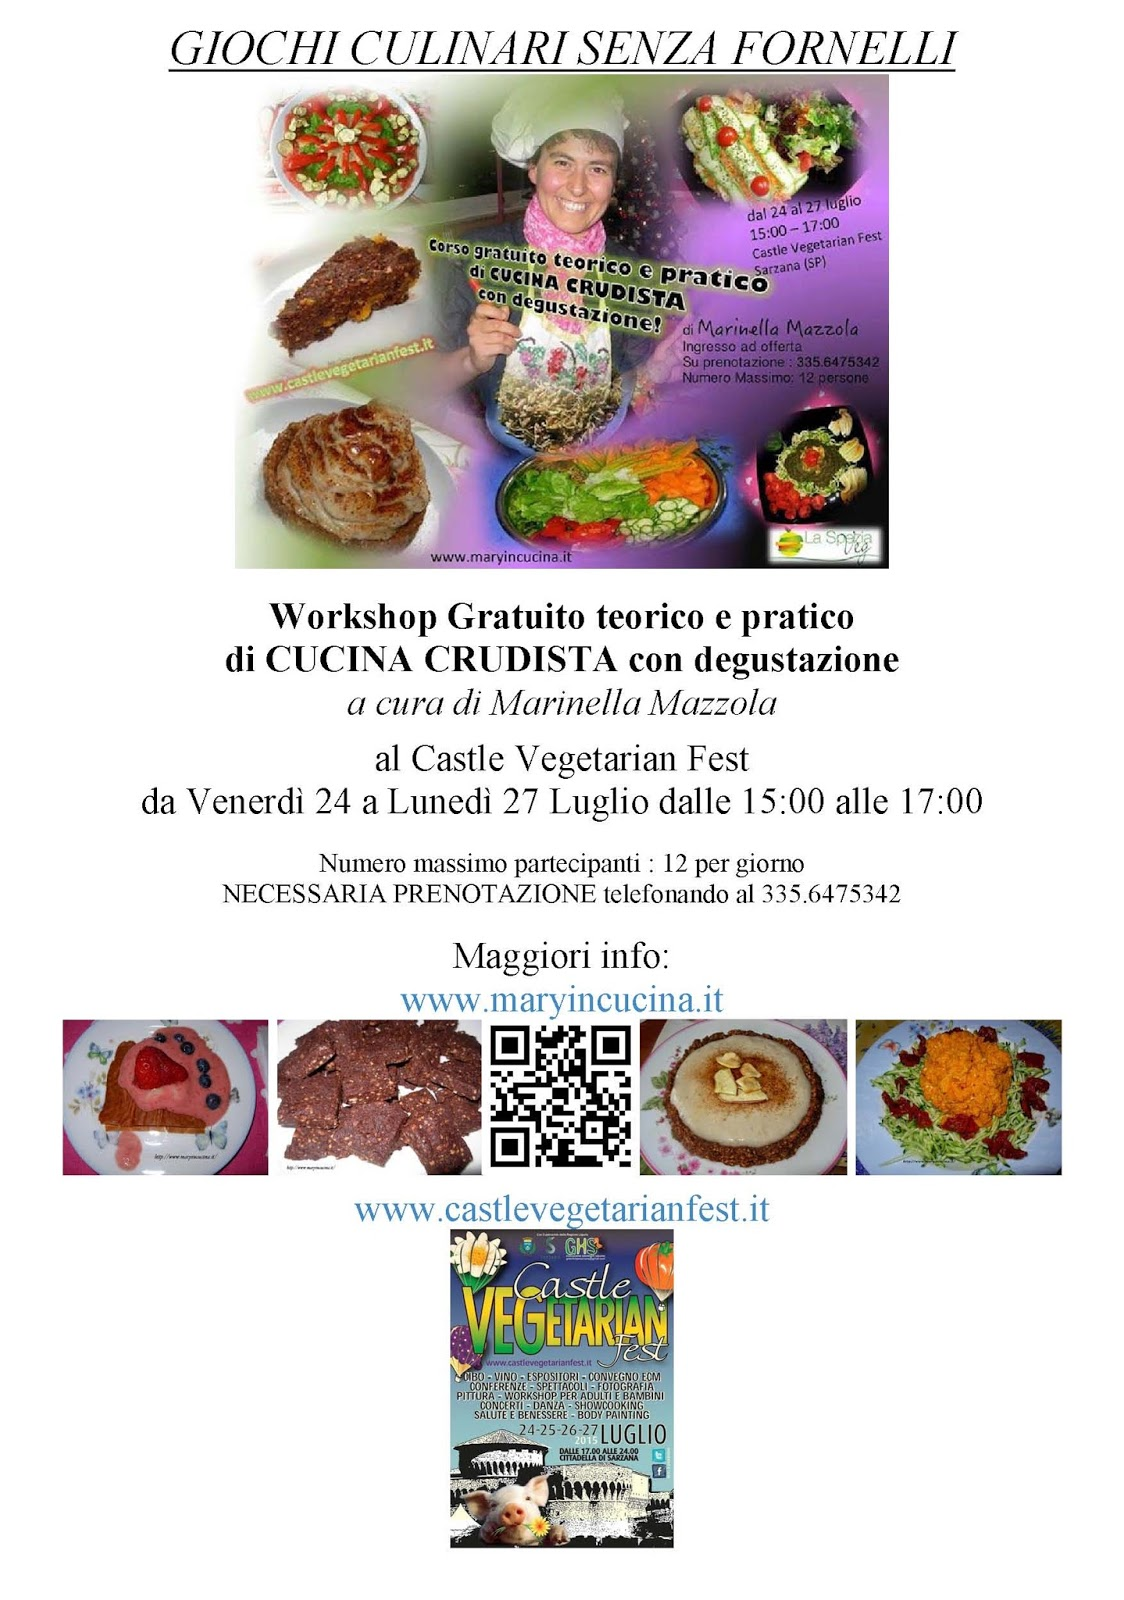 Giochi di cucina senza fornelli al castle vegetarian fest - Giochi di cucina a livelli ...